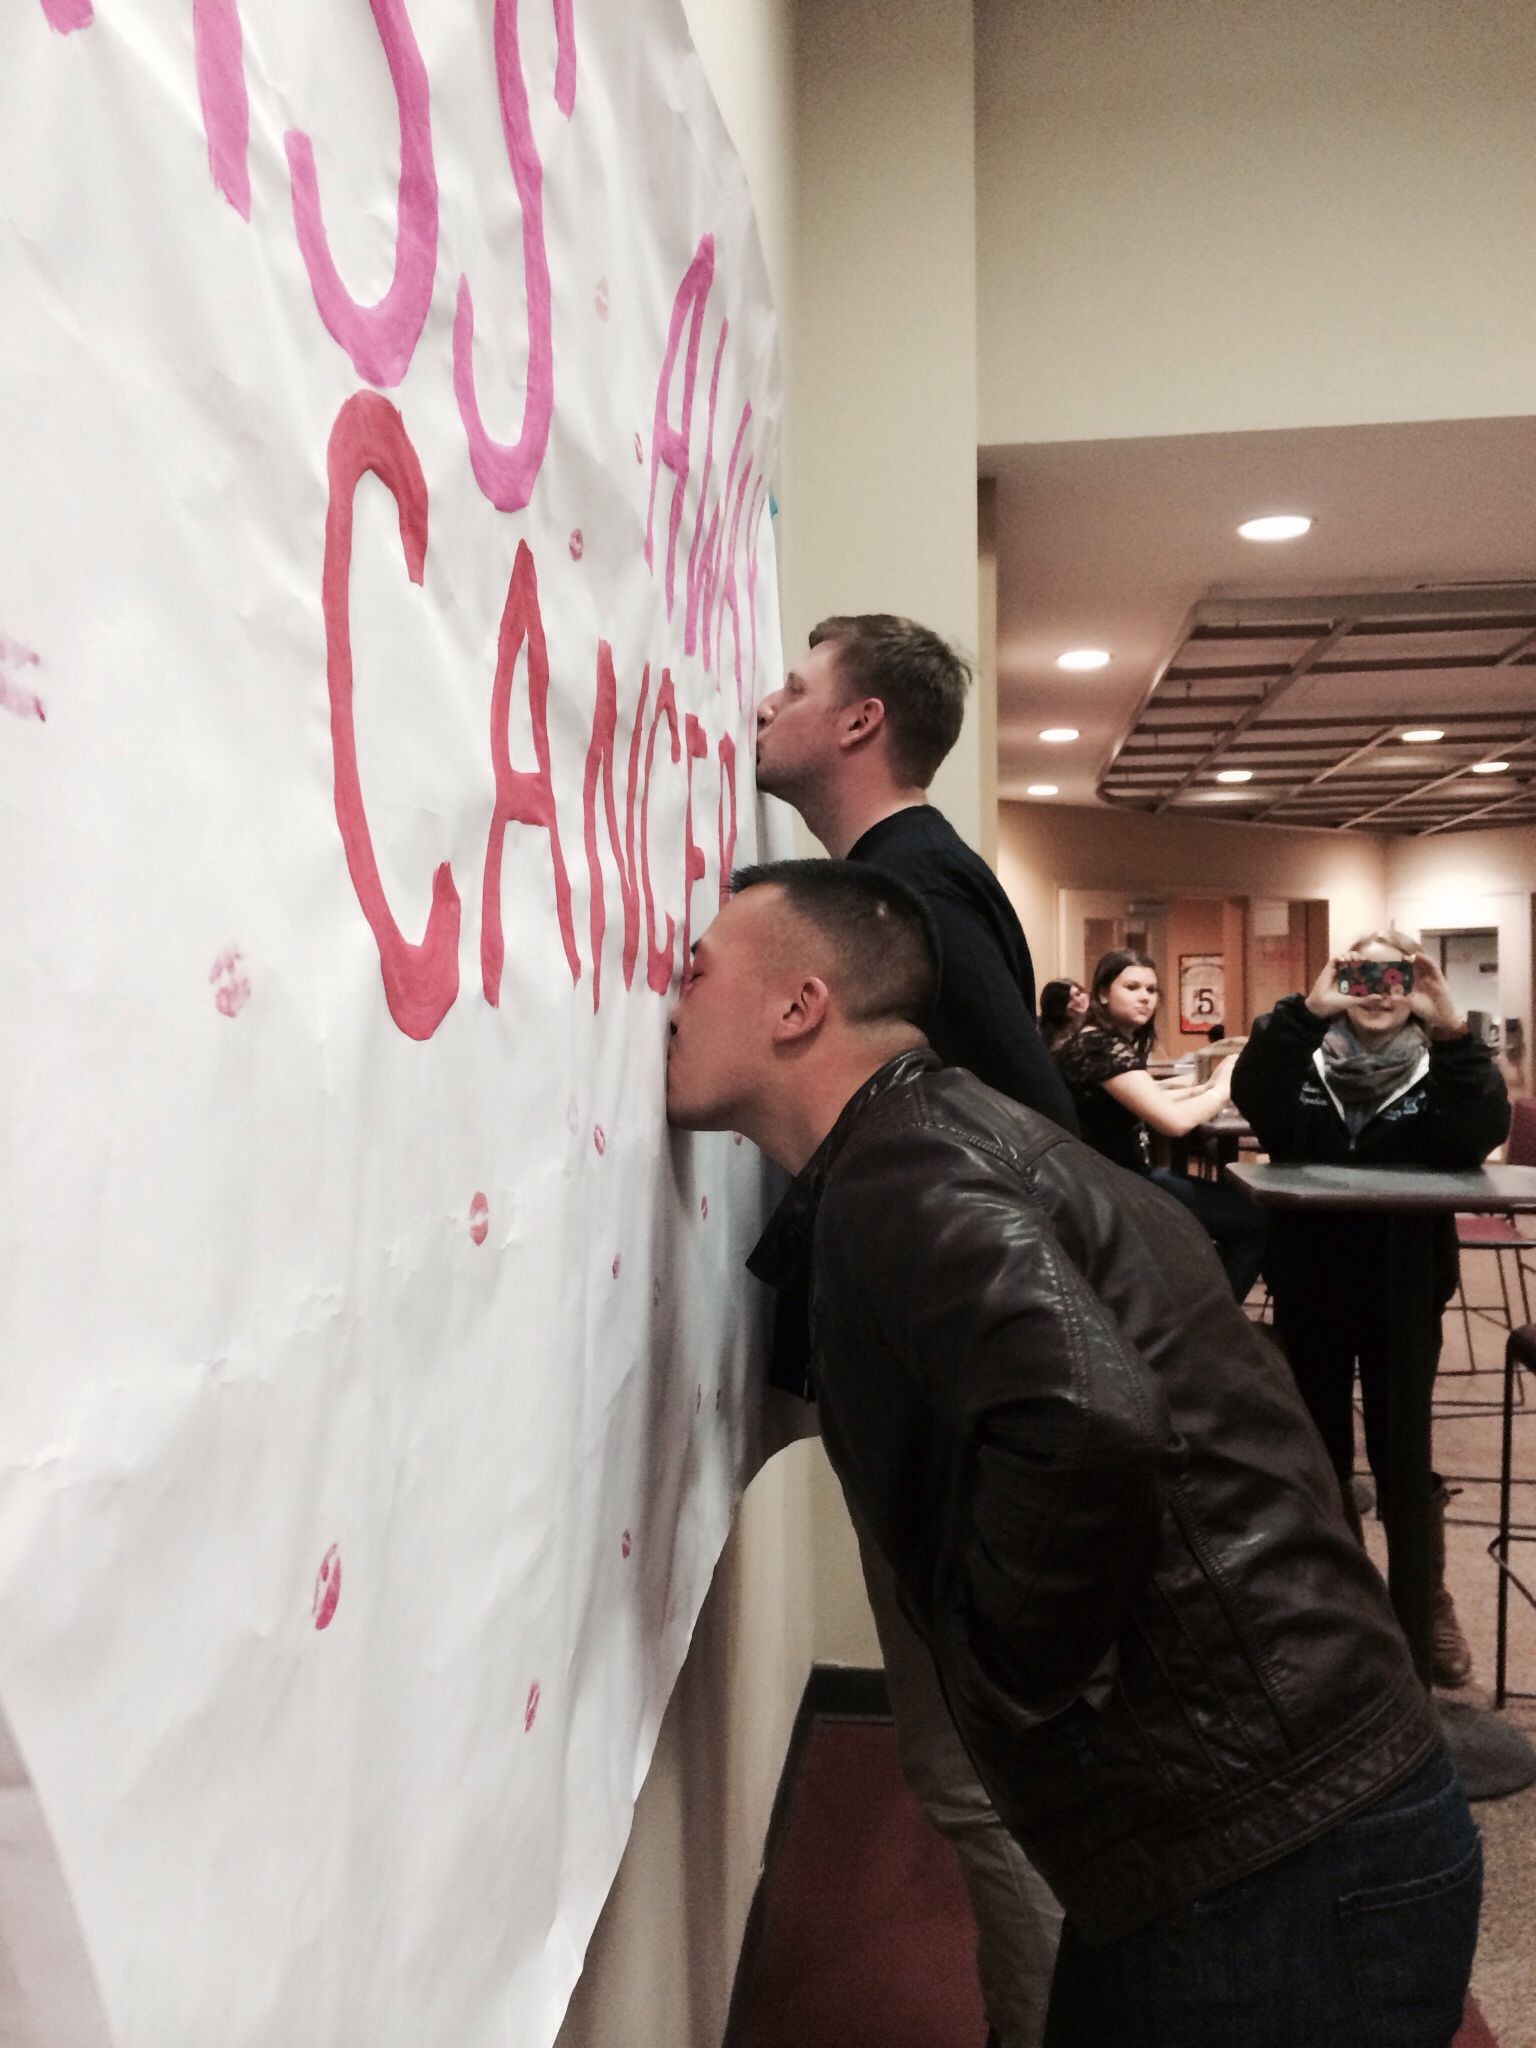 Kiss Away Cancer Zeta Tau Alpha At Rider University Think Pink